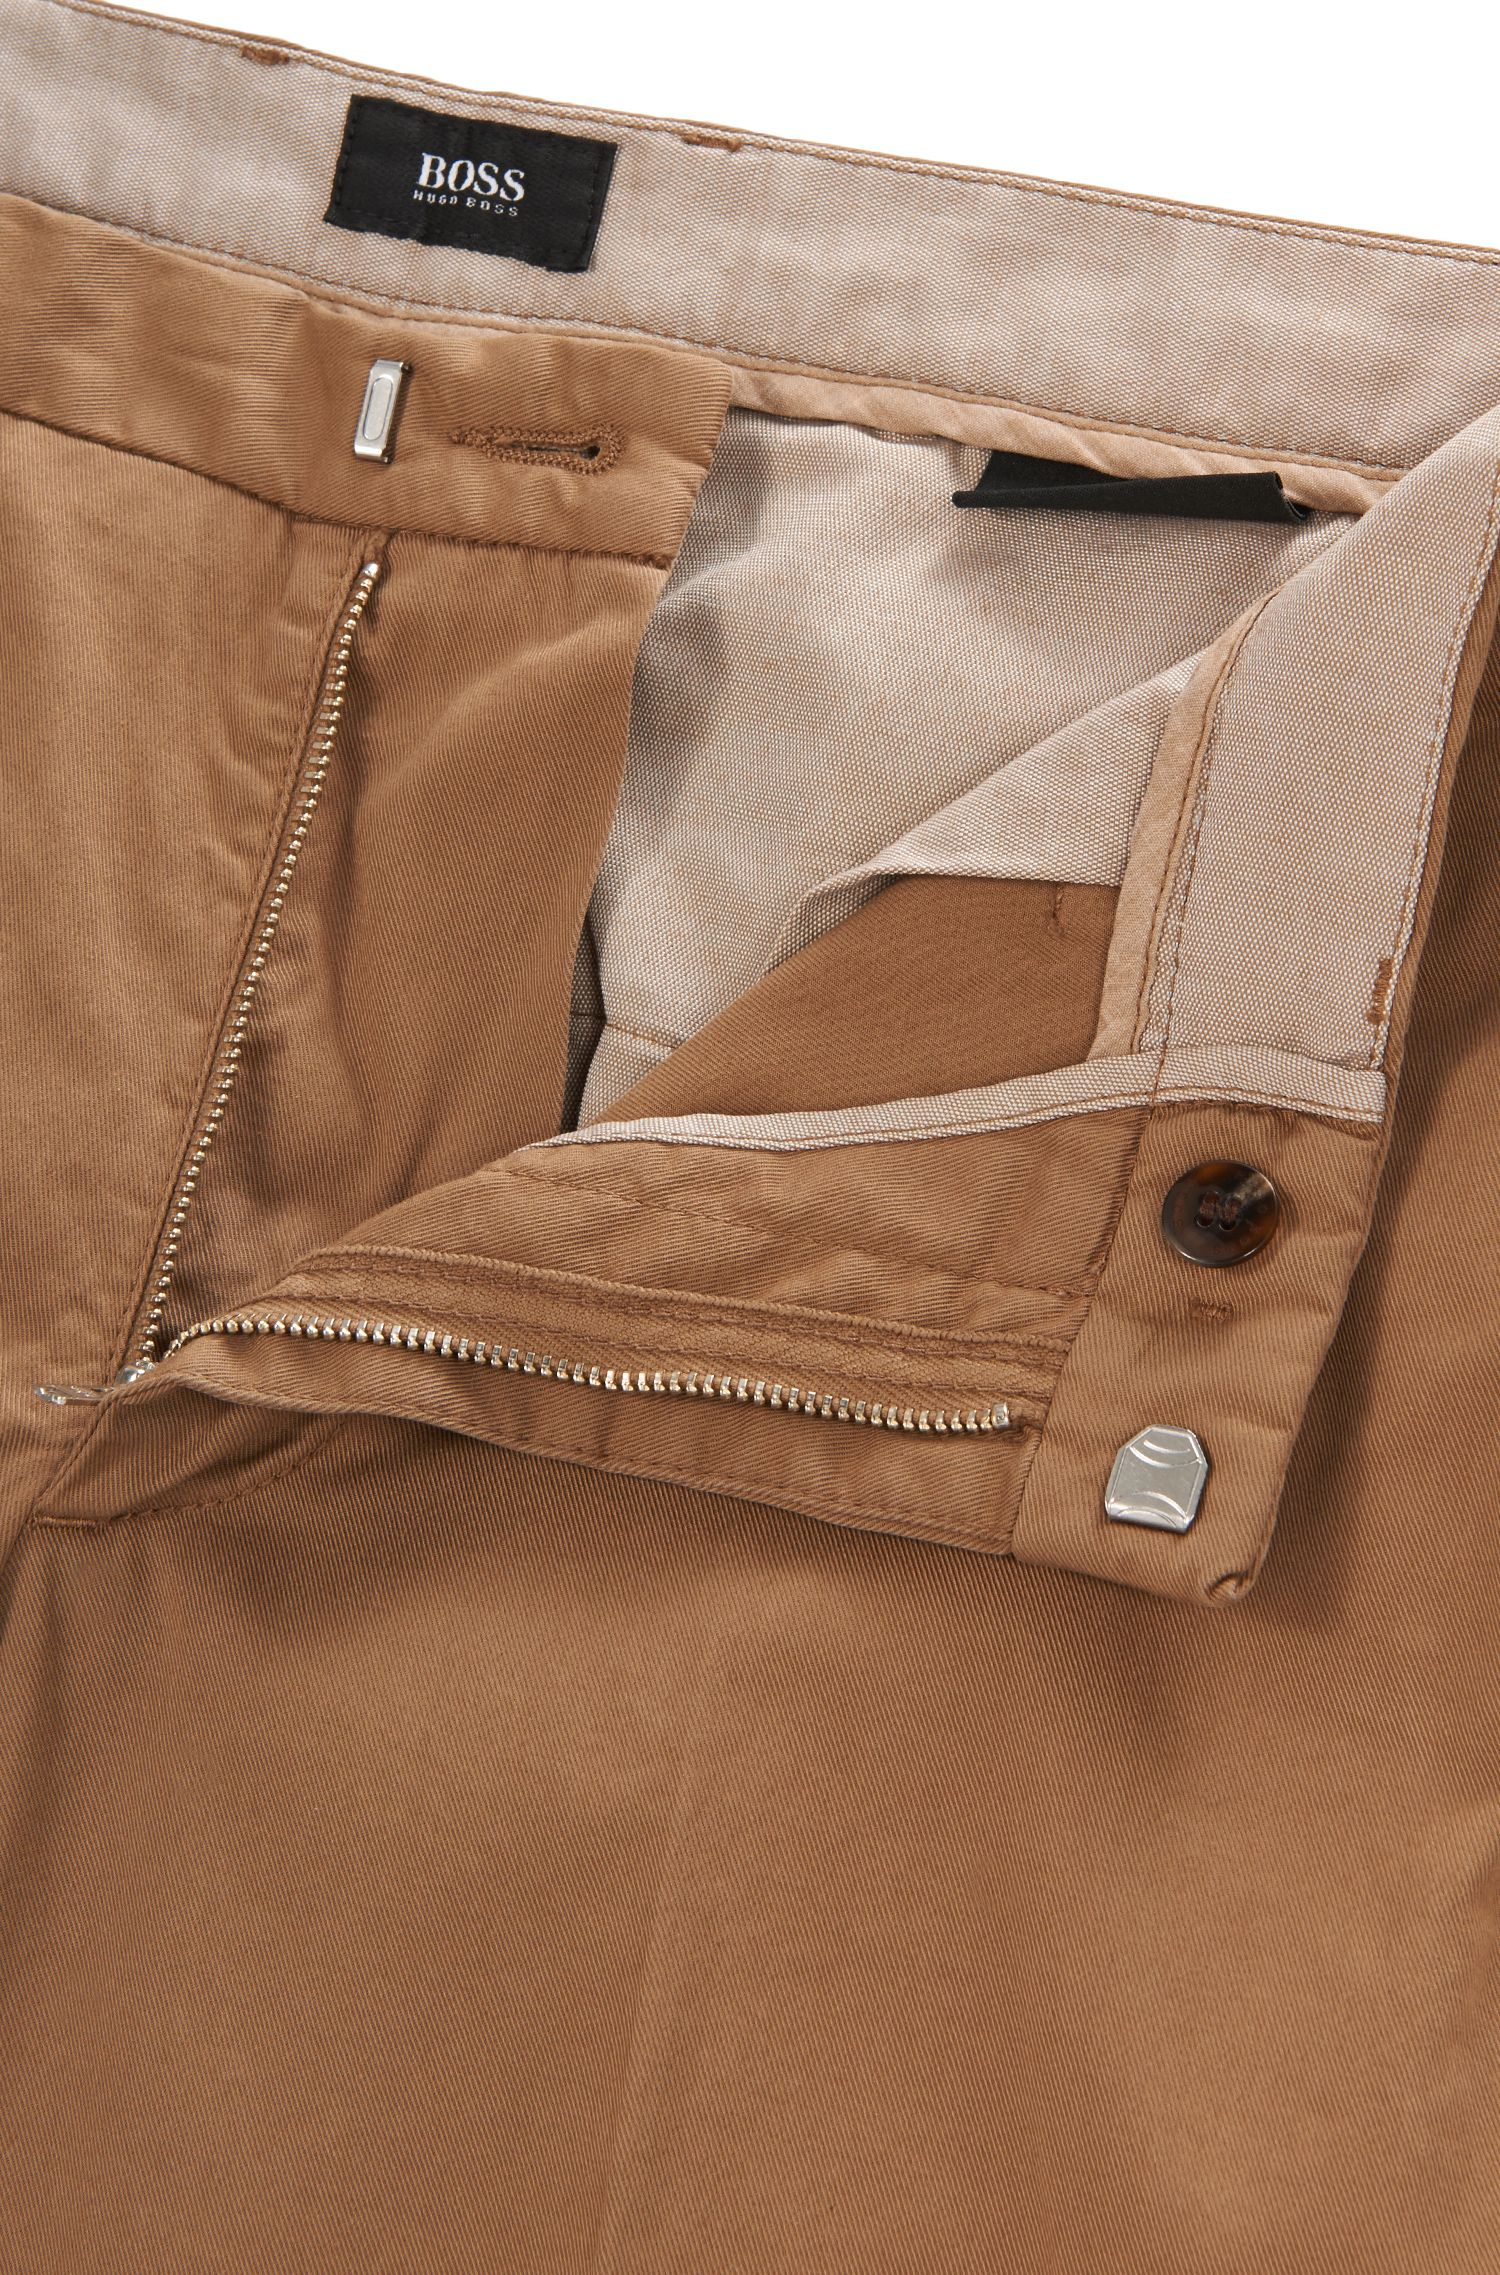 Gabardine Stretch Cotton Chino Pants, Slim Fit | Kaito Pat D